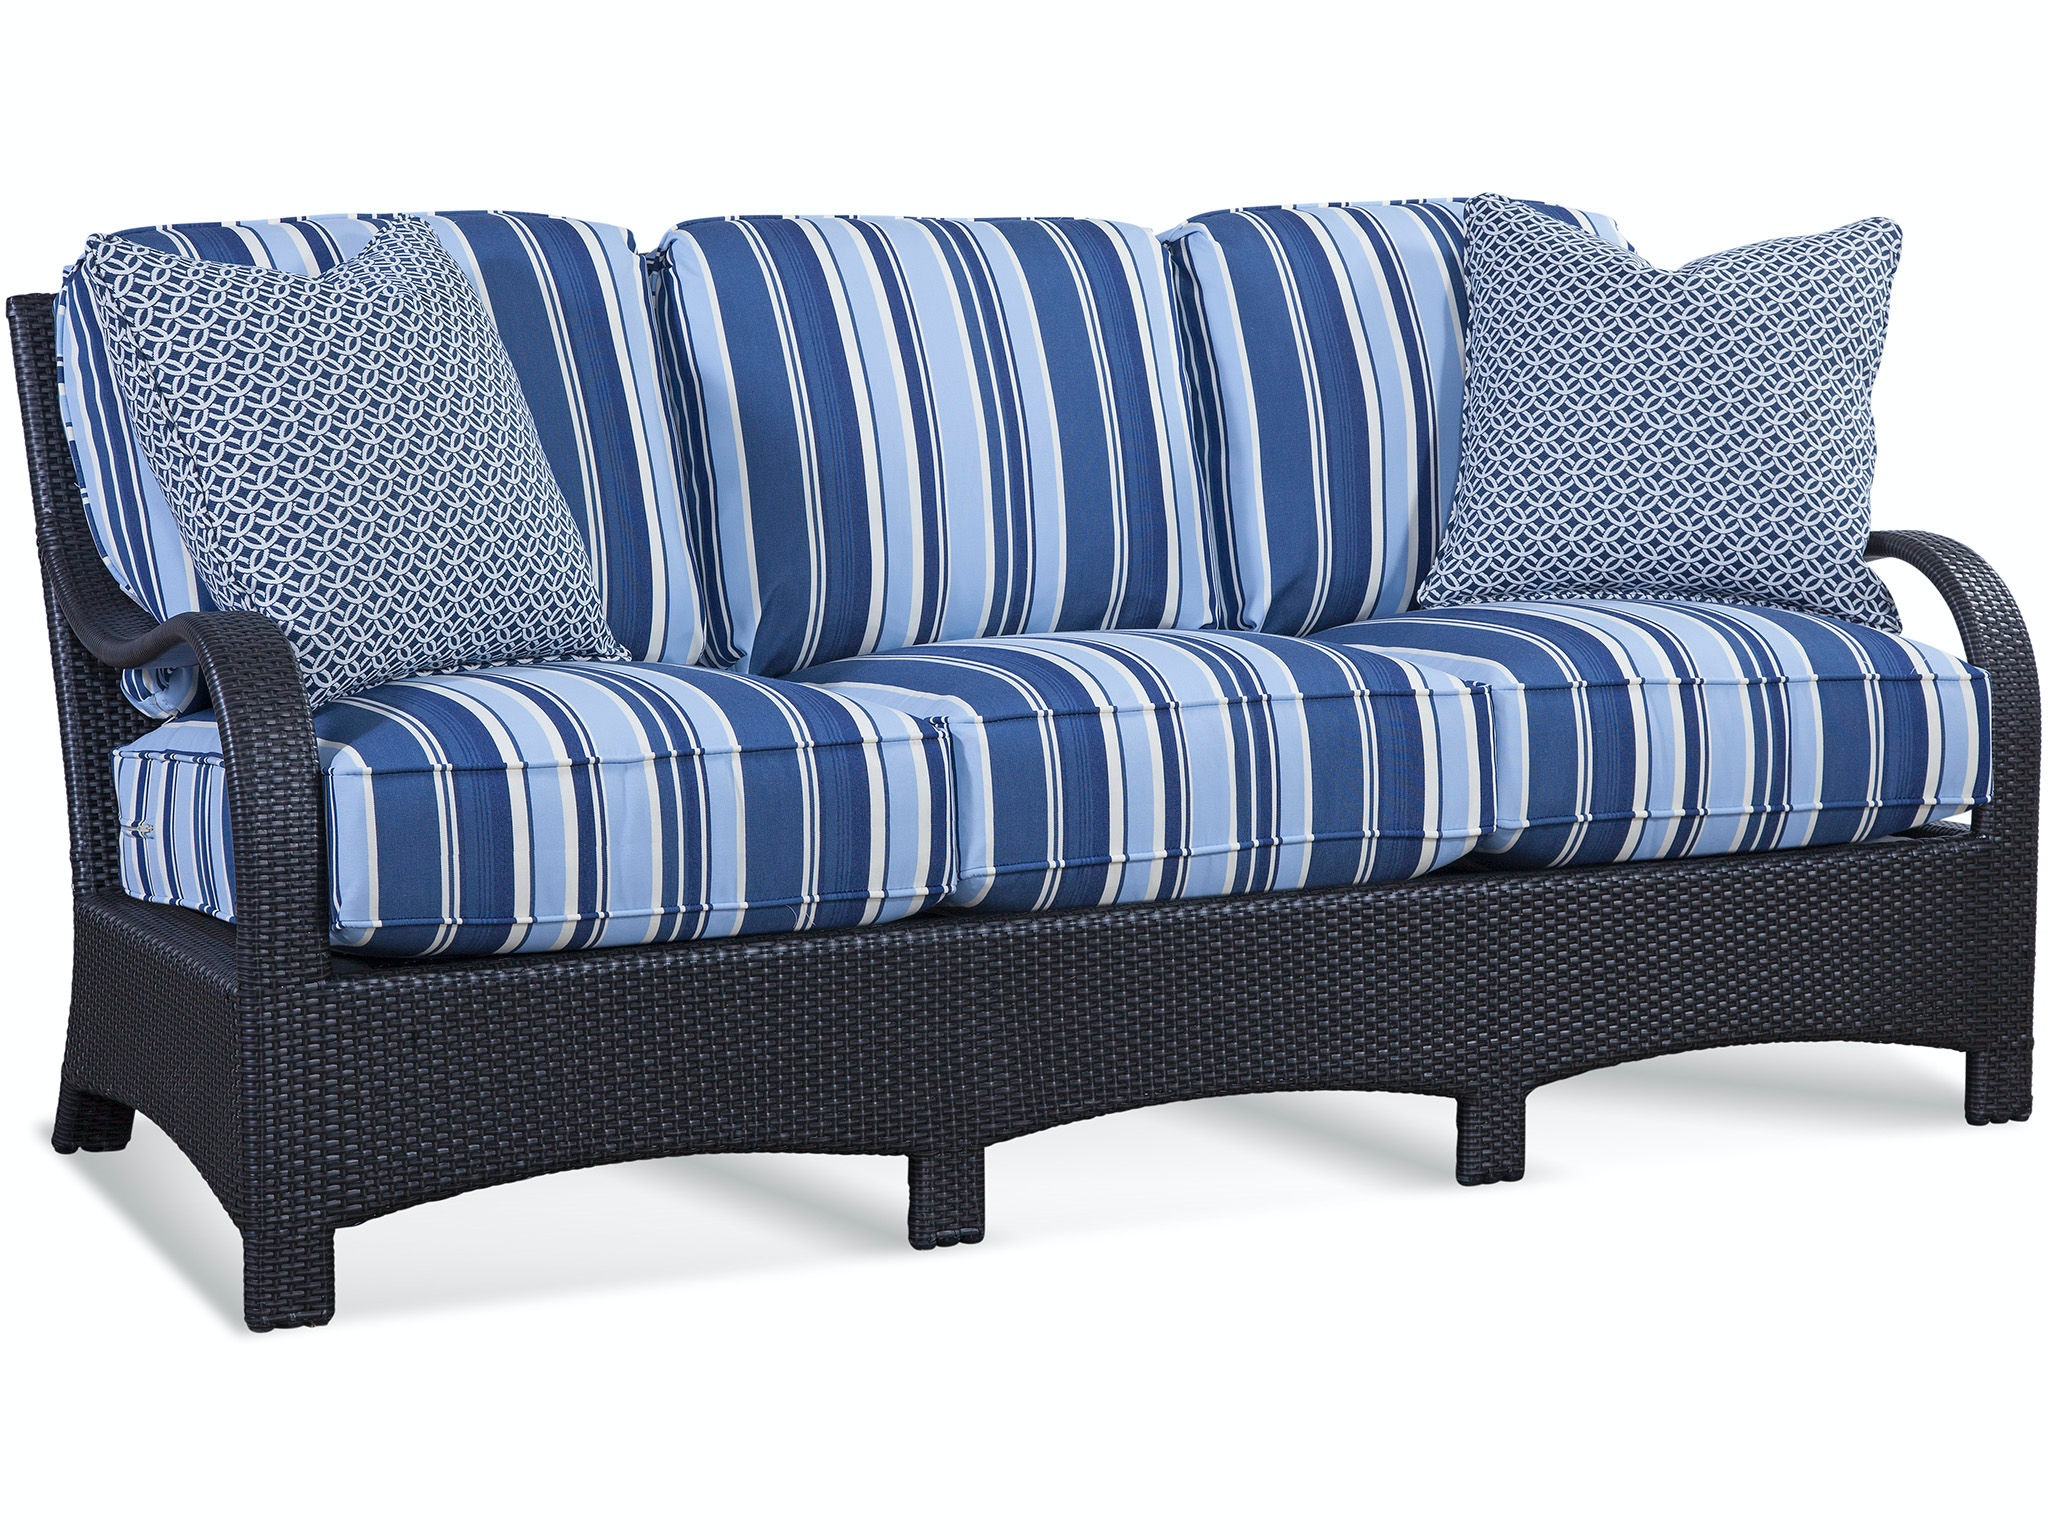 Braxton Culler OutdoorPatio Sofa 435 011 Custom Home